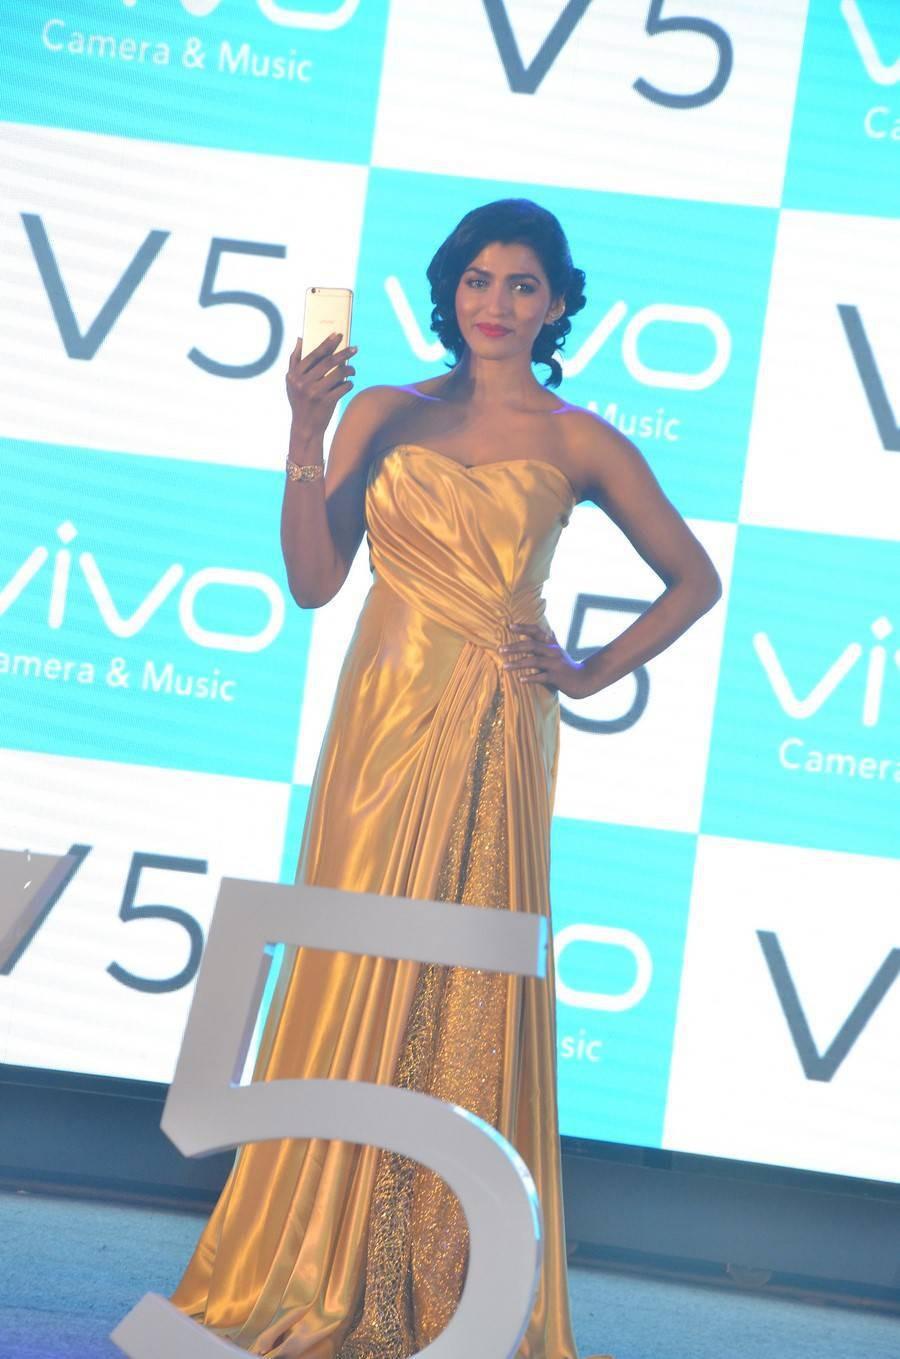 Dhansika at Vivo V5 Mobile,Dhansika,Vivo V5 Mobile,Vivo V5 Mobile launch,Vivo V5 Mobile pics,Vivo V5 Mobile images,Vivo V5 Mobile photos,Vivo V5 Mobile stills,Vivo V5 Mobile pictures